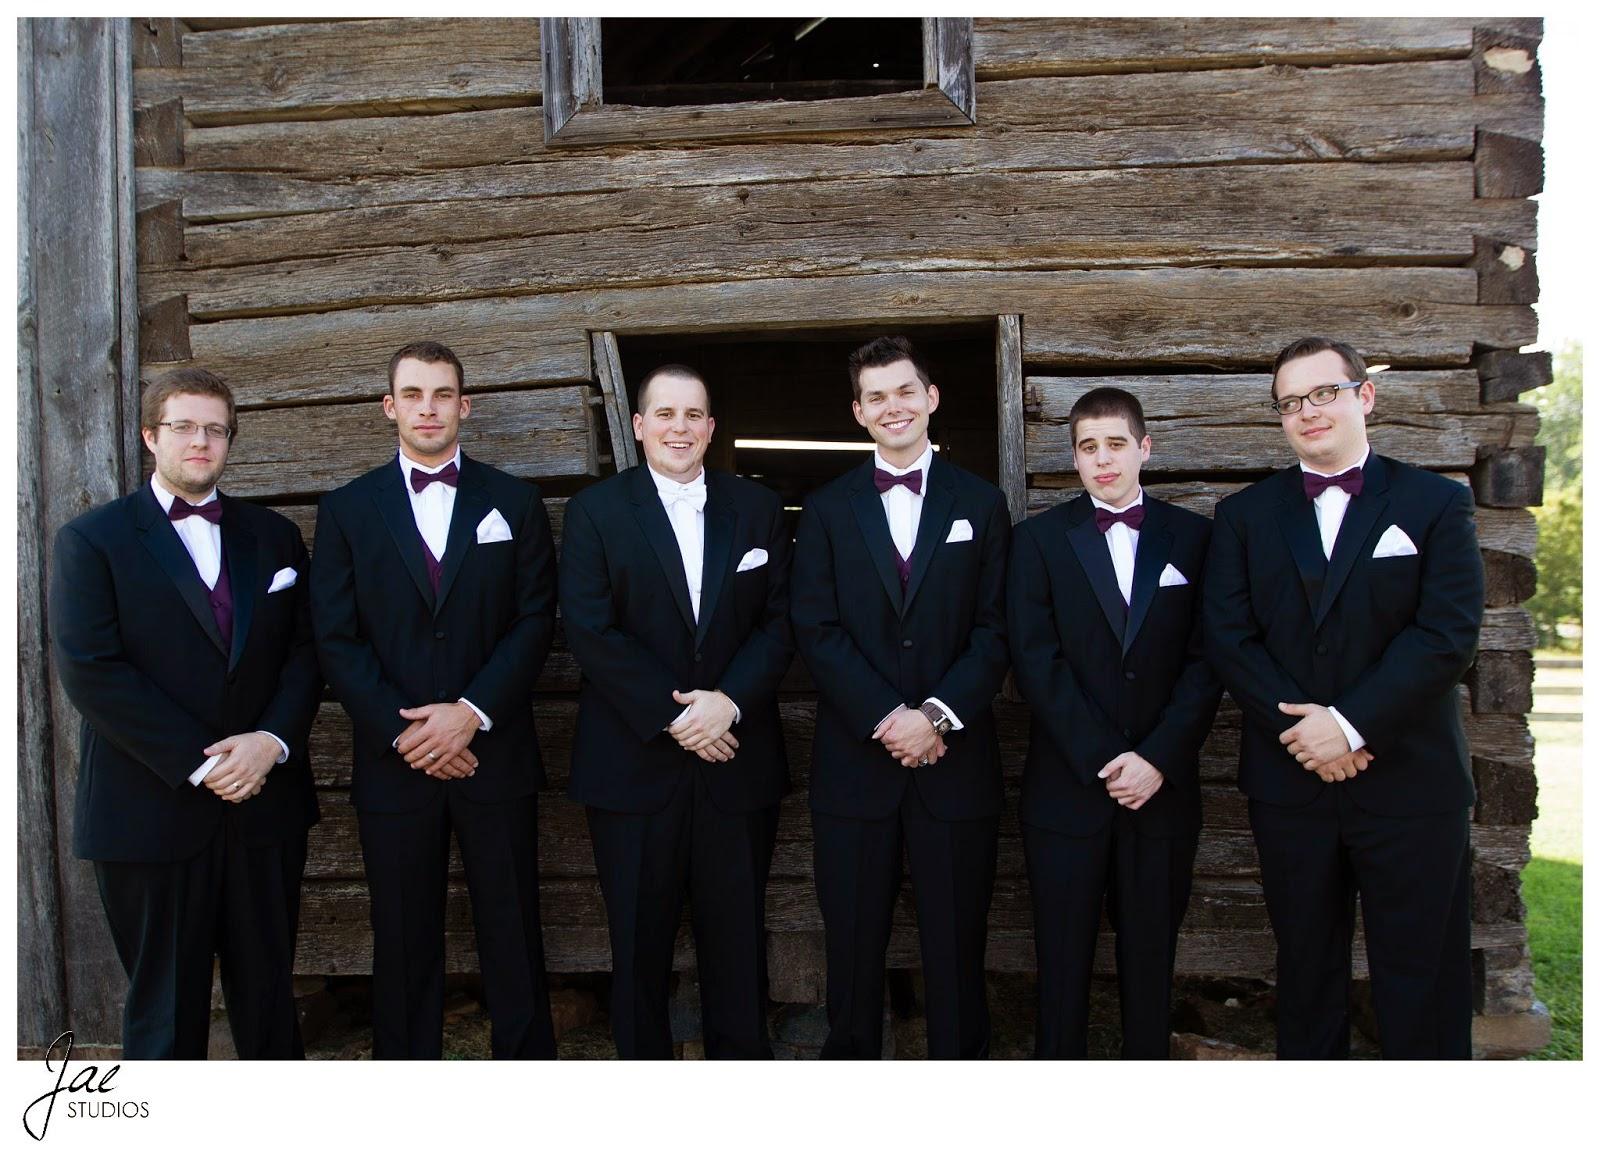 Jonathan and Julie, Bird cage, West Manor Estate, Wedding, Lynchburg, Virginia, Jae Studios, groomsmen, best man, posing, wood building